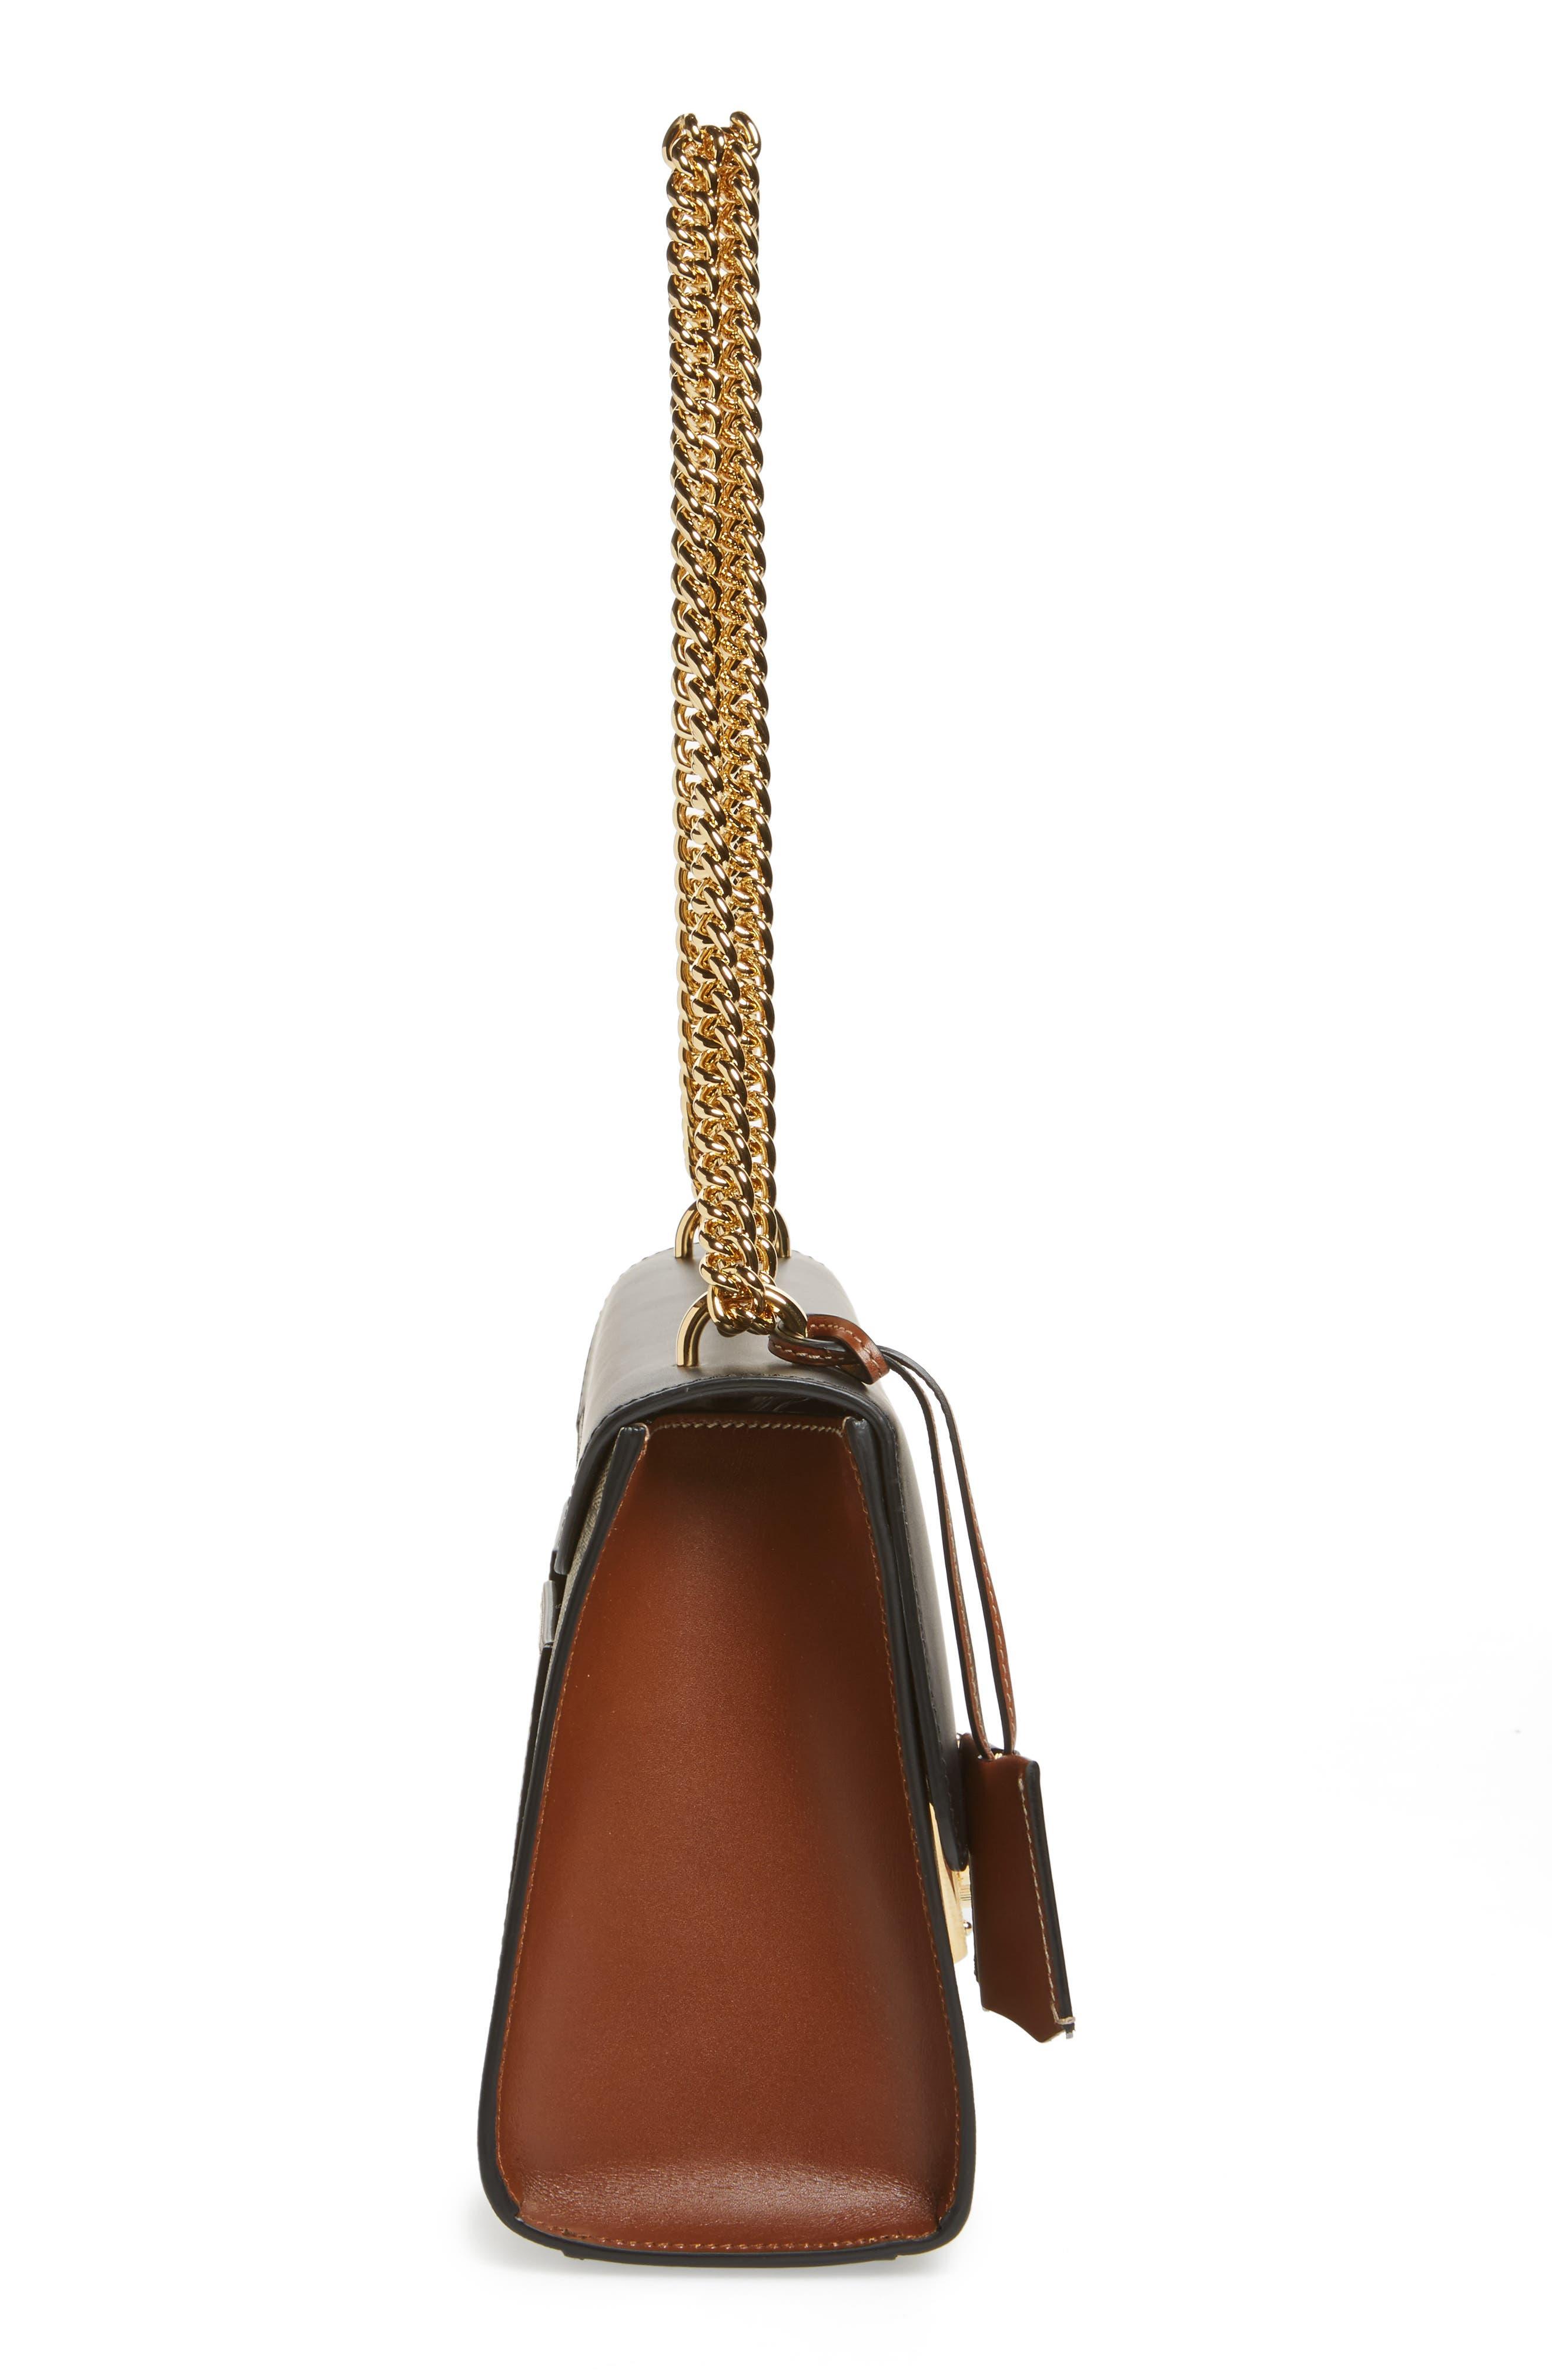 Medium Padlock Leather Shoulder Bag,                             Alternate thumbnail 5, color,                             MOON/ TOSCANO